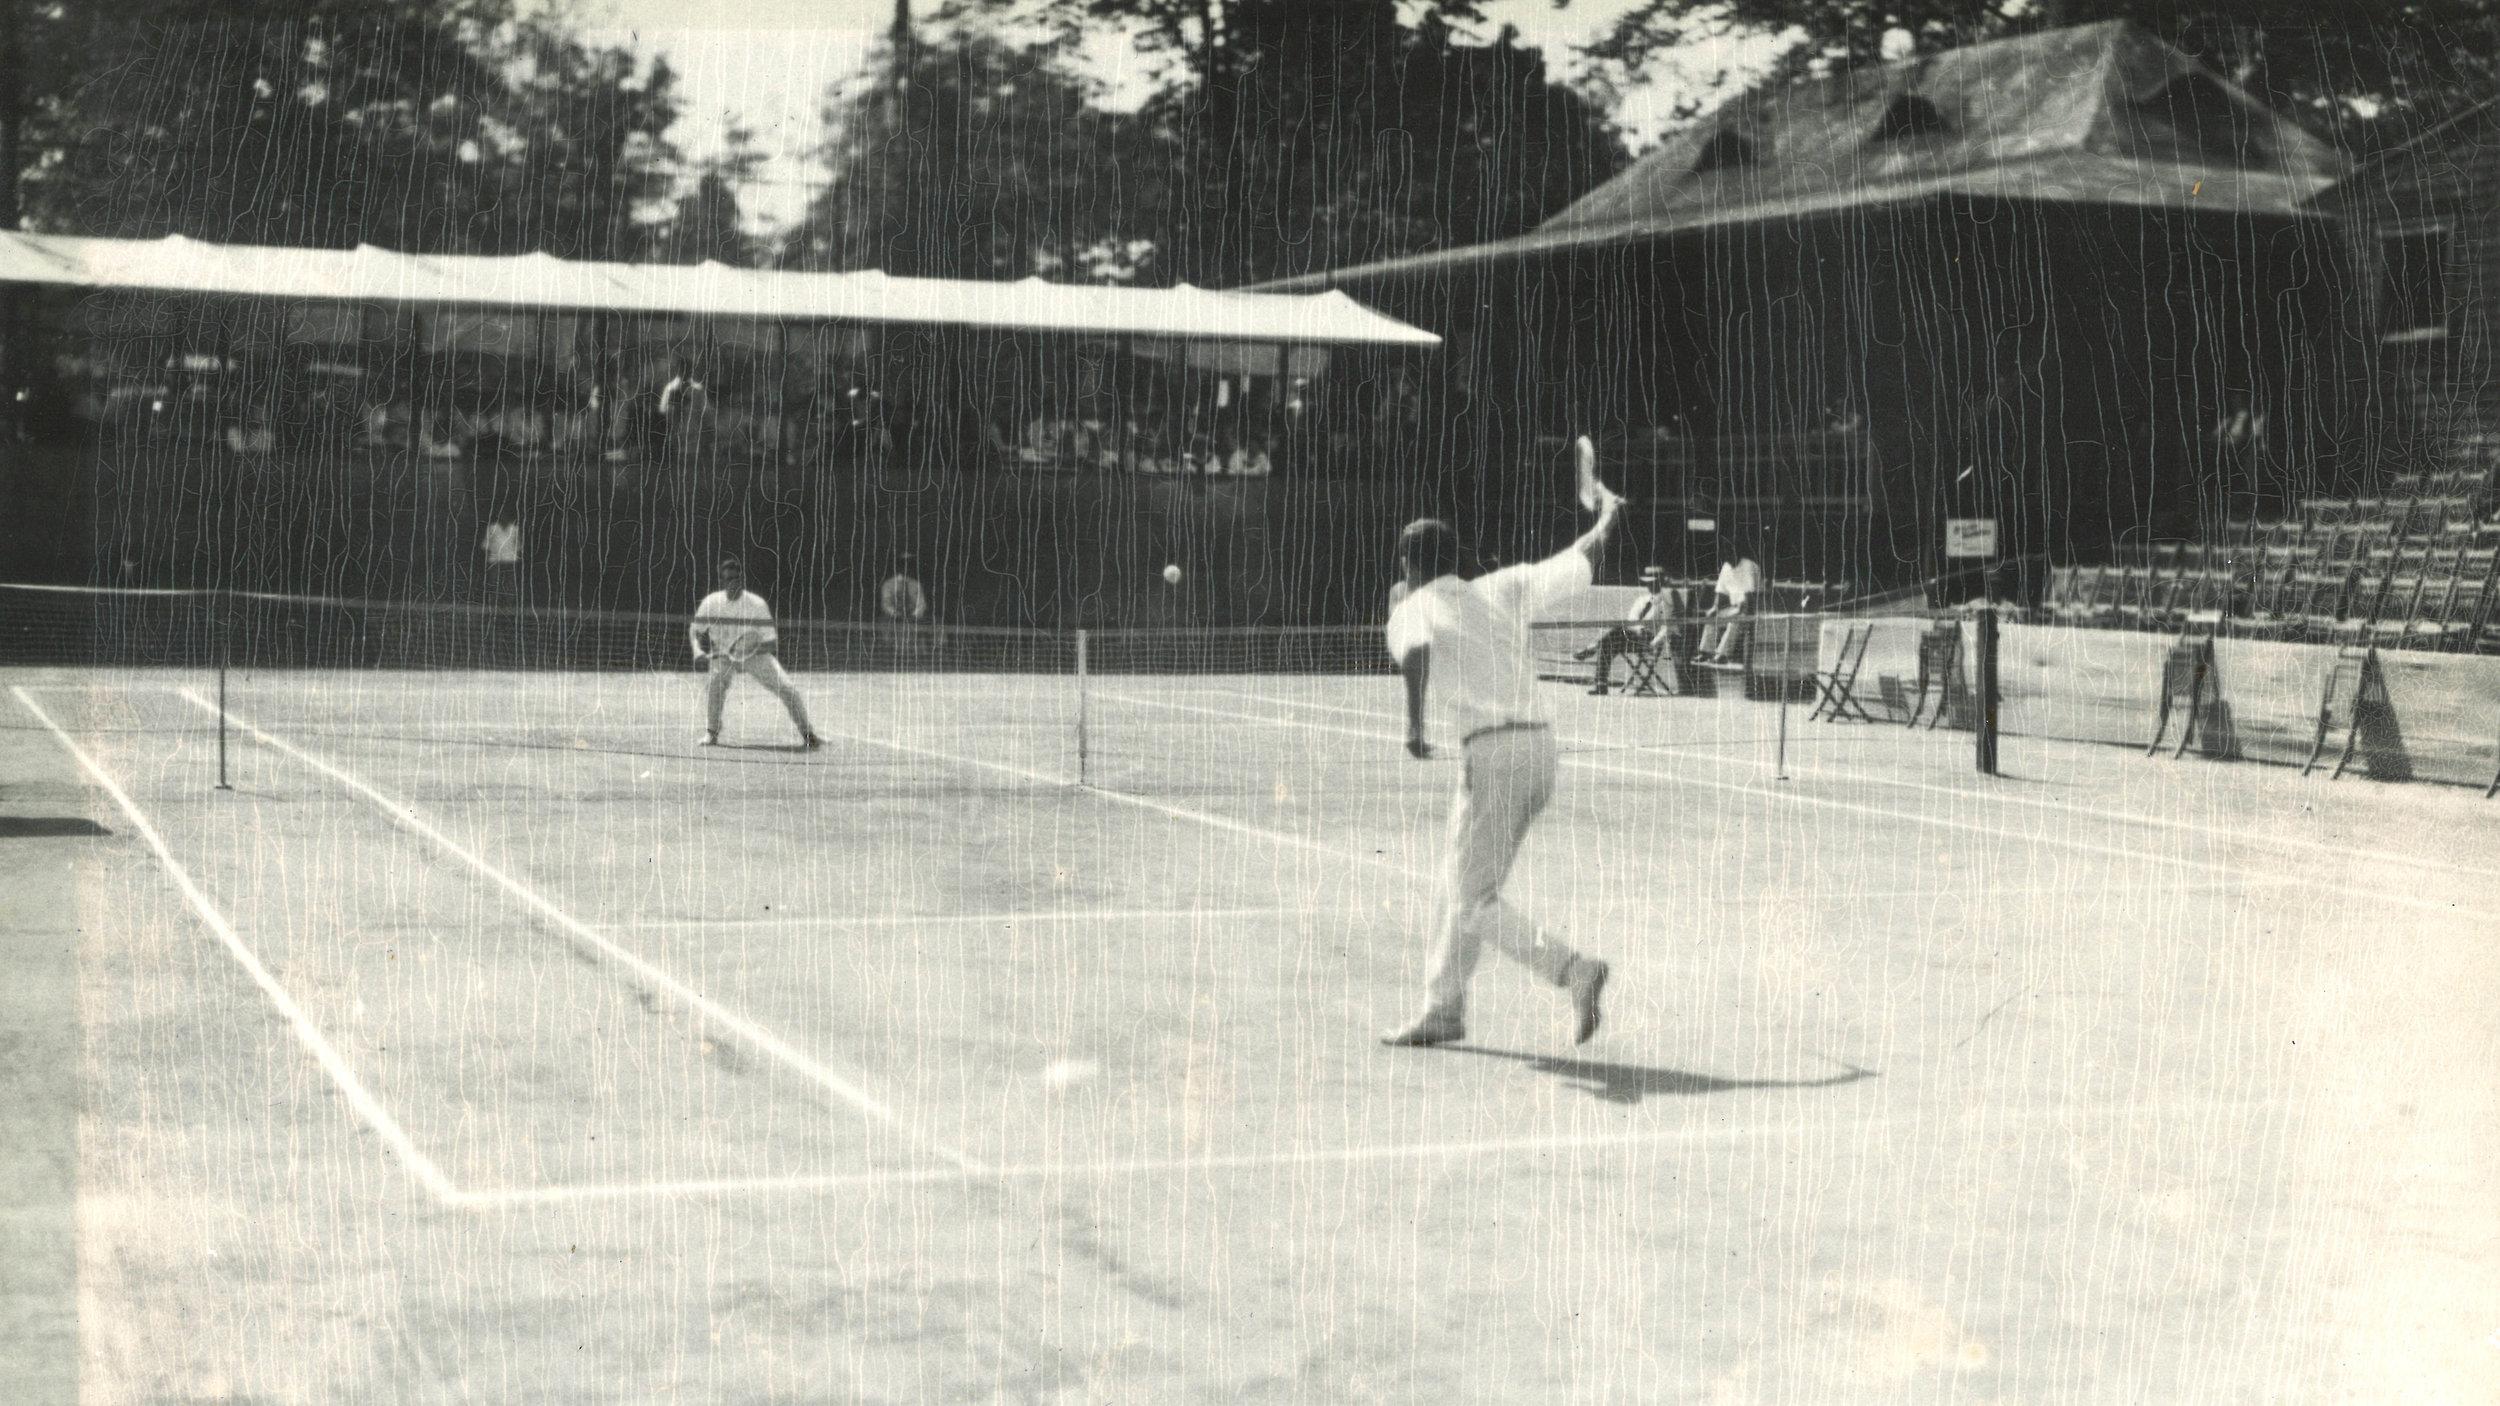 Practice round in 1916